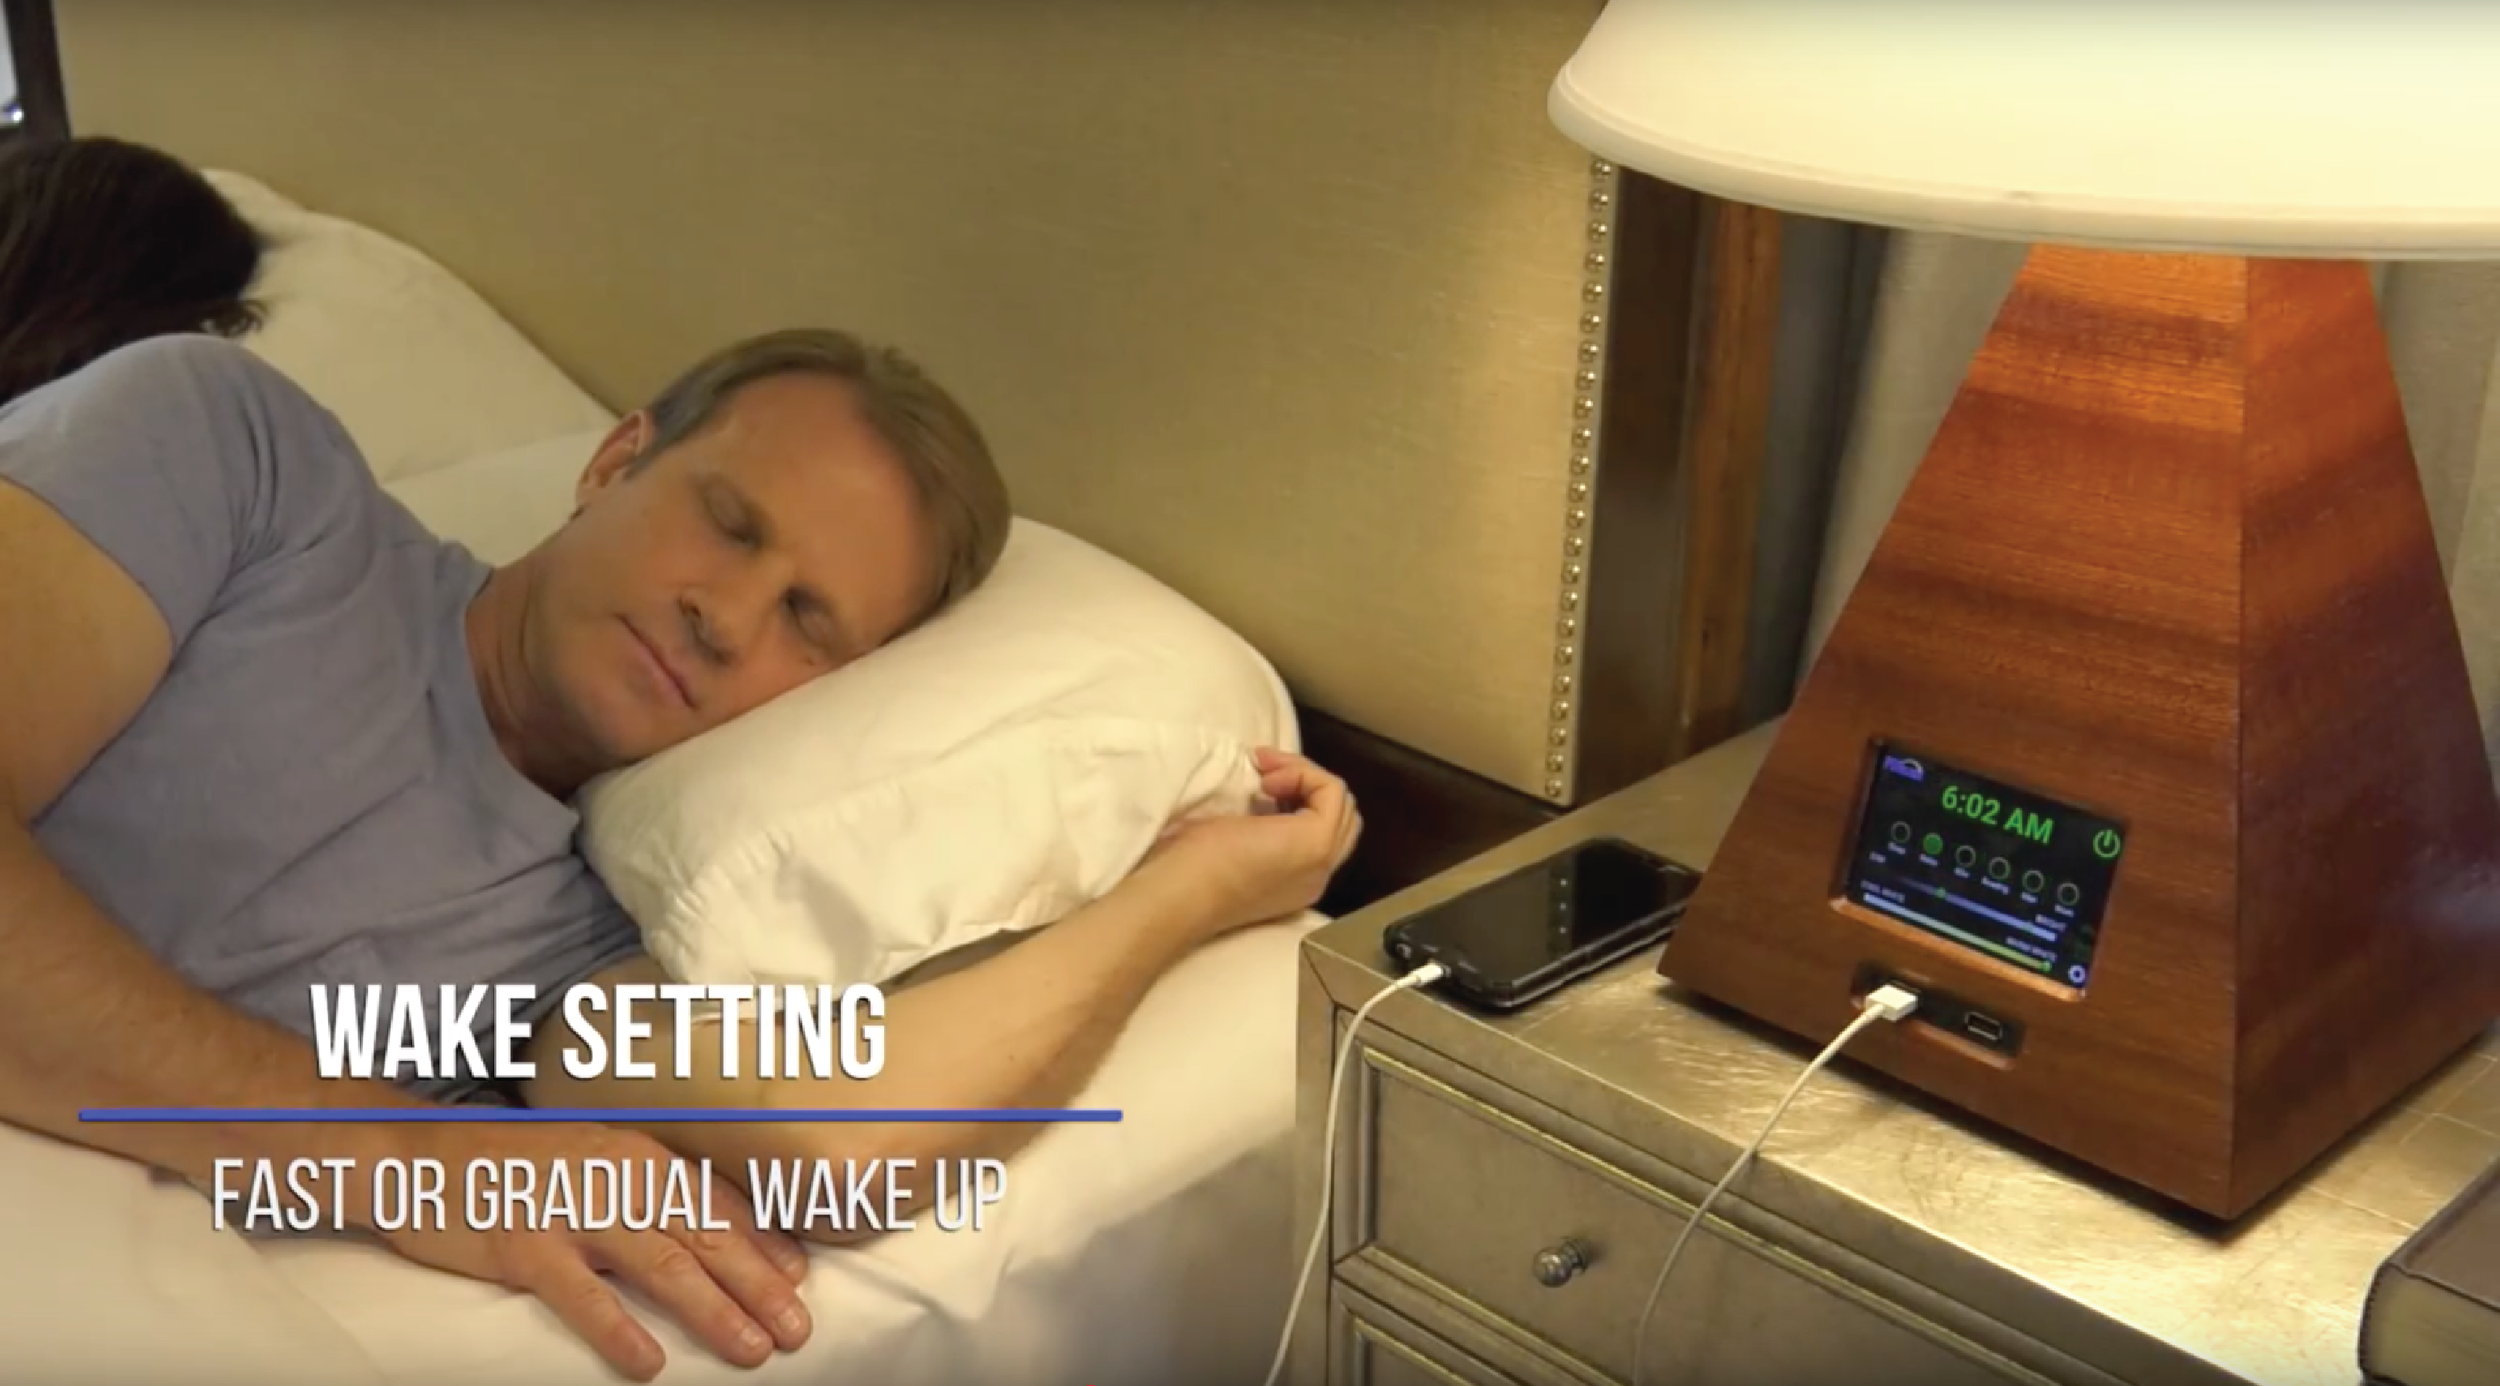 Wake setting: Simulate a sunrise to gently start your day.  (Turn on the optional audible alarm if you sleep like a log.)